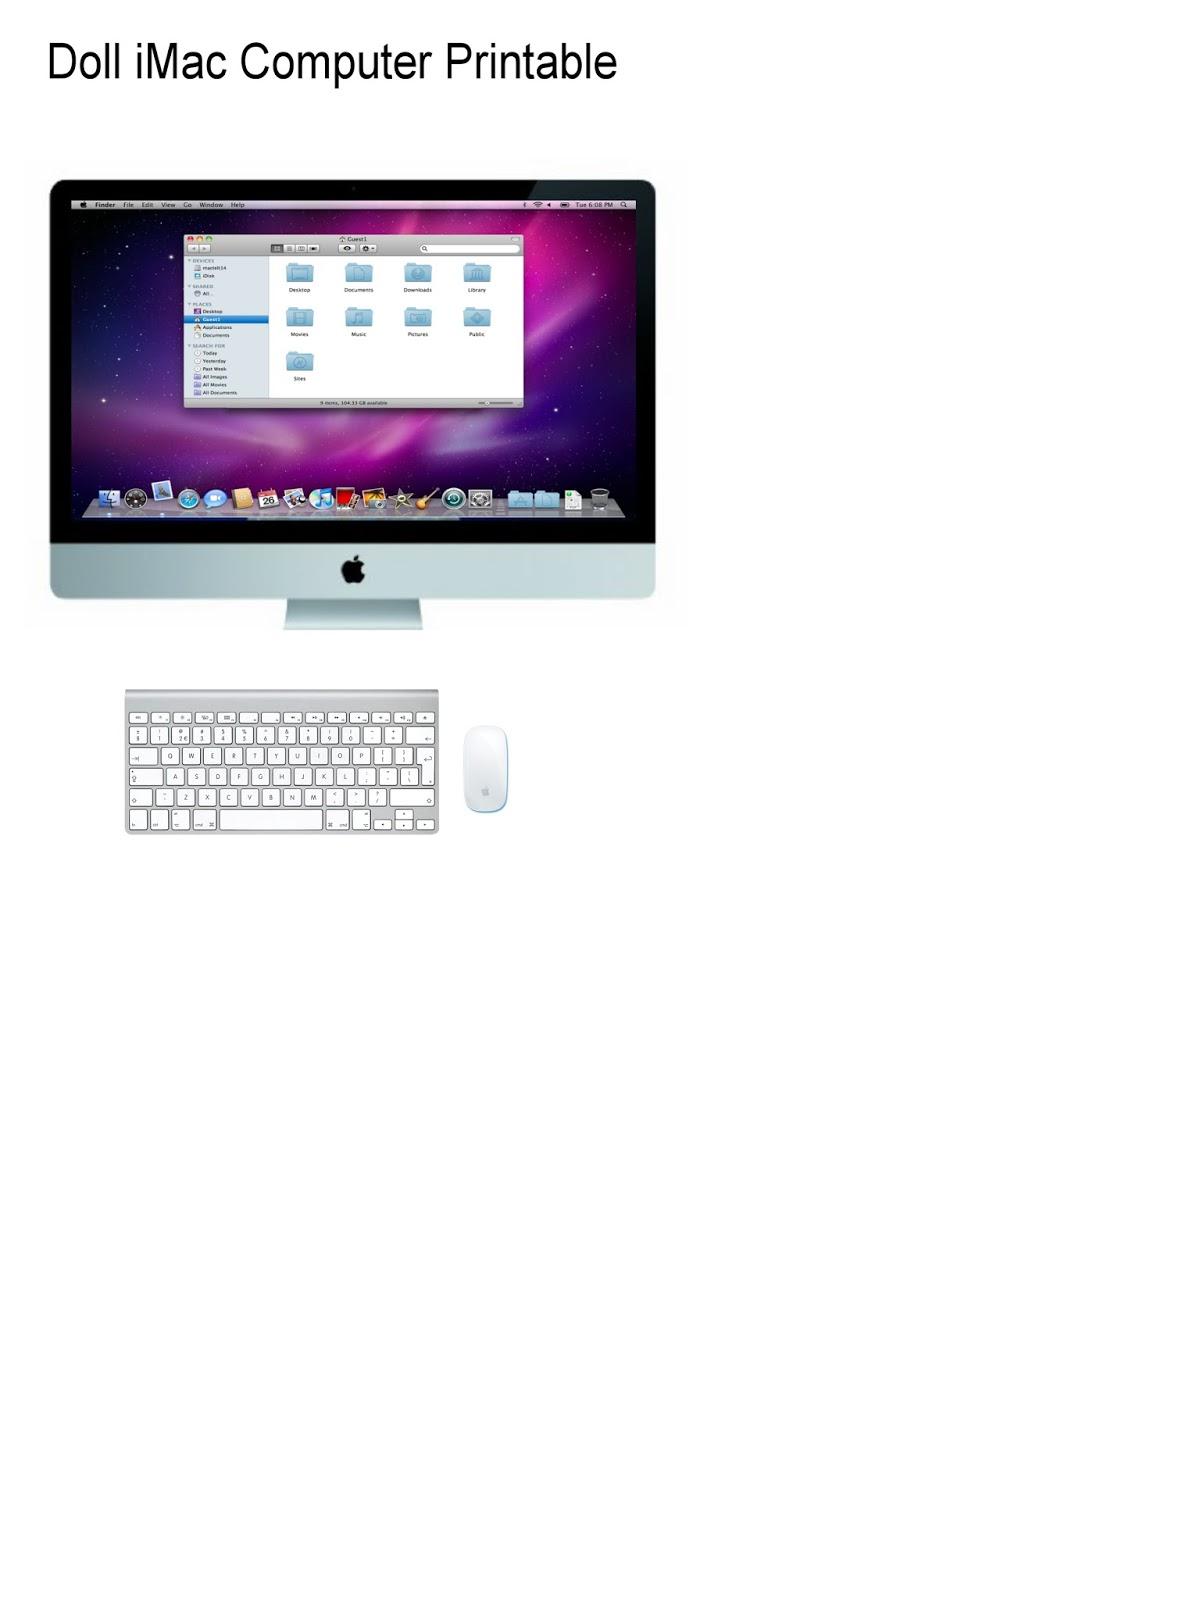 uCreate: Doll Apple iMac Template